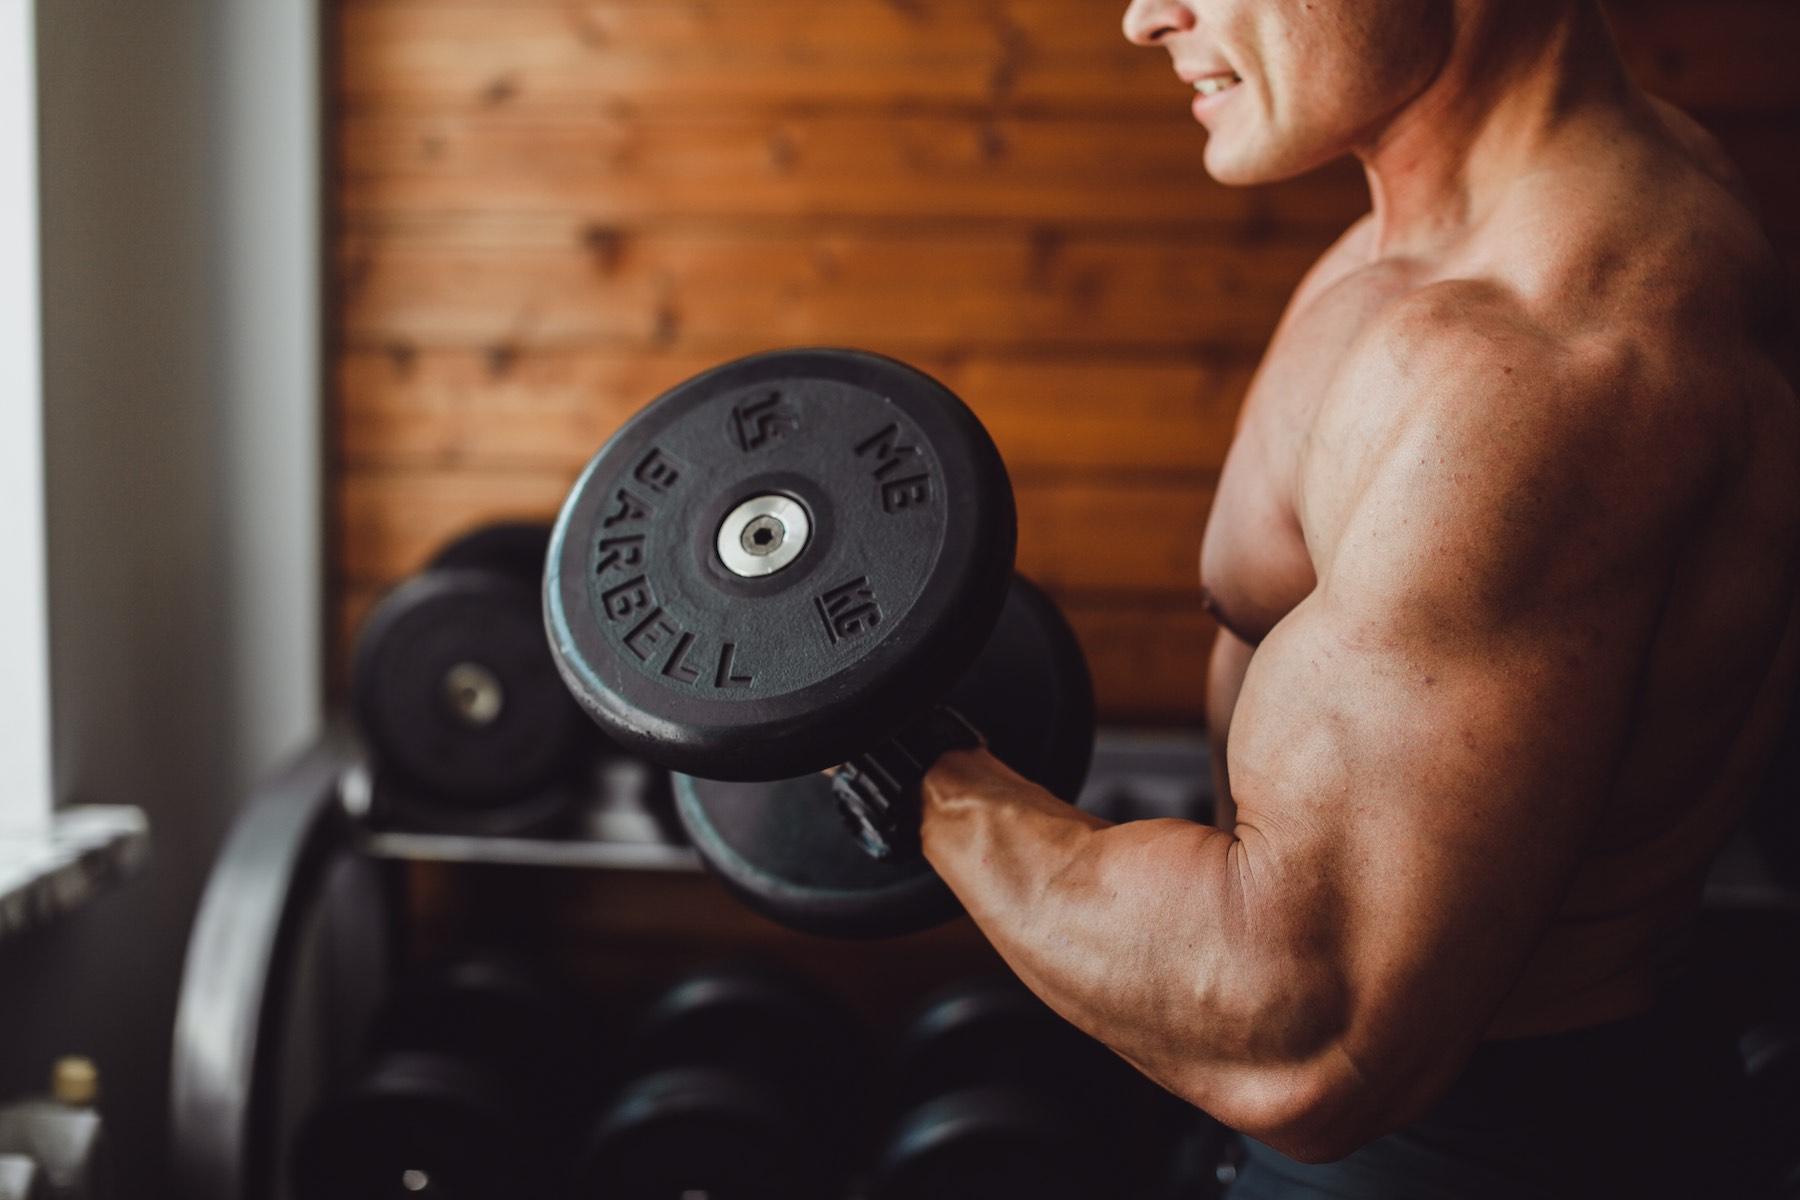 Gym anabolic steroids